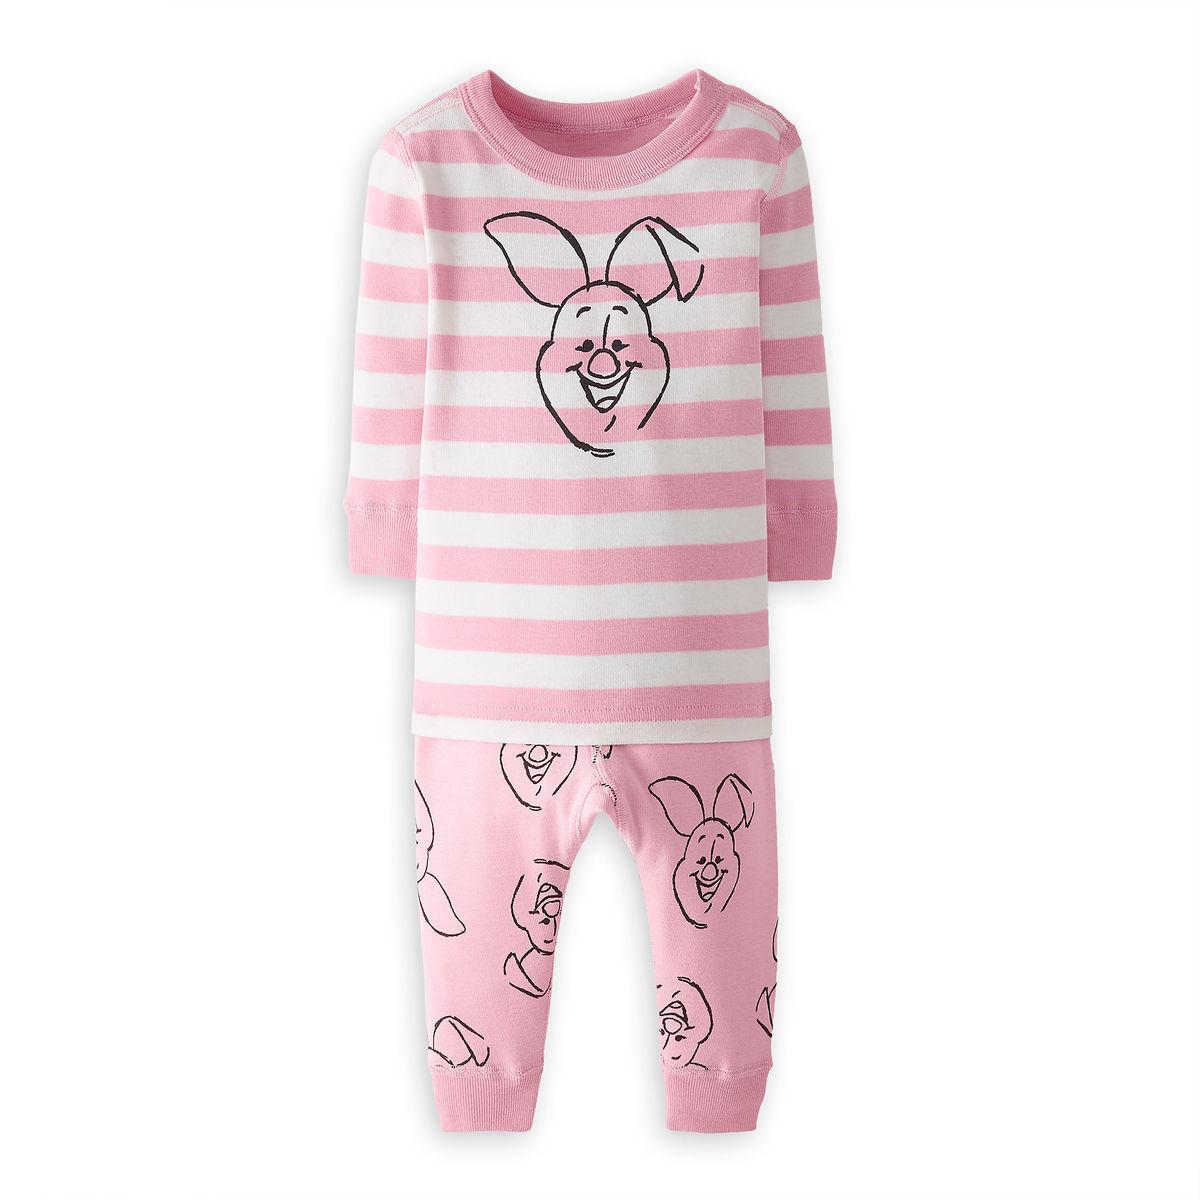 ec9fe8cc2259 Piglet Organic Long John Pajama Set for Baby by Hanna Andersson ...